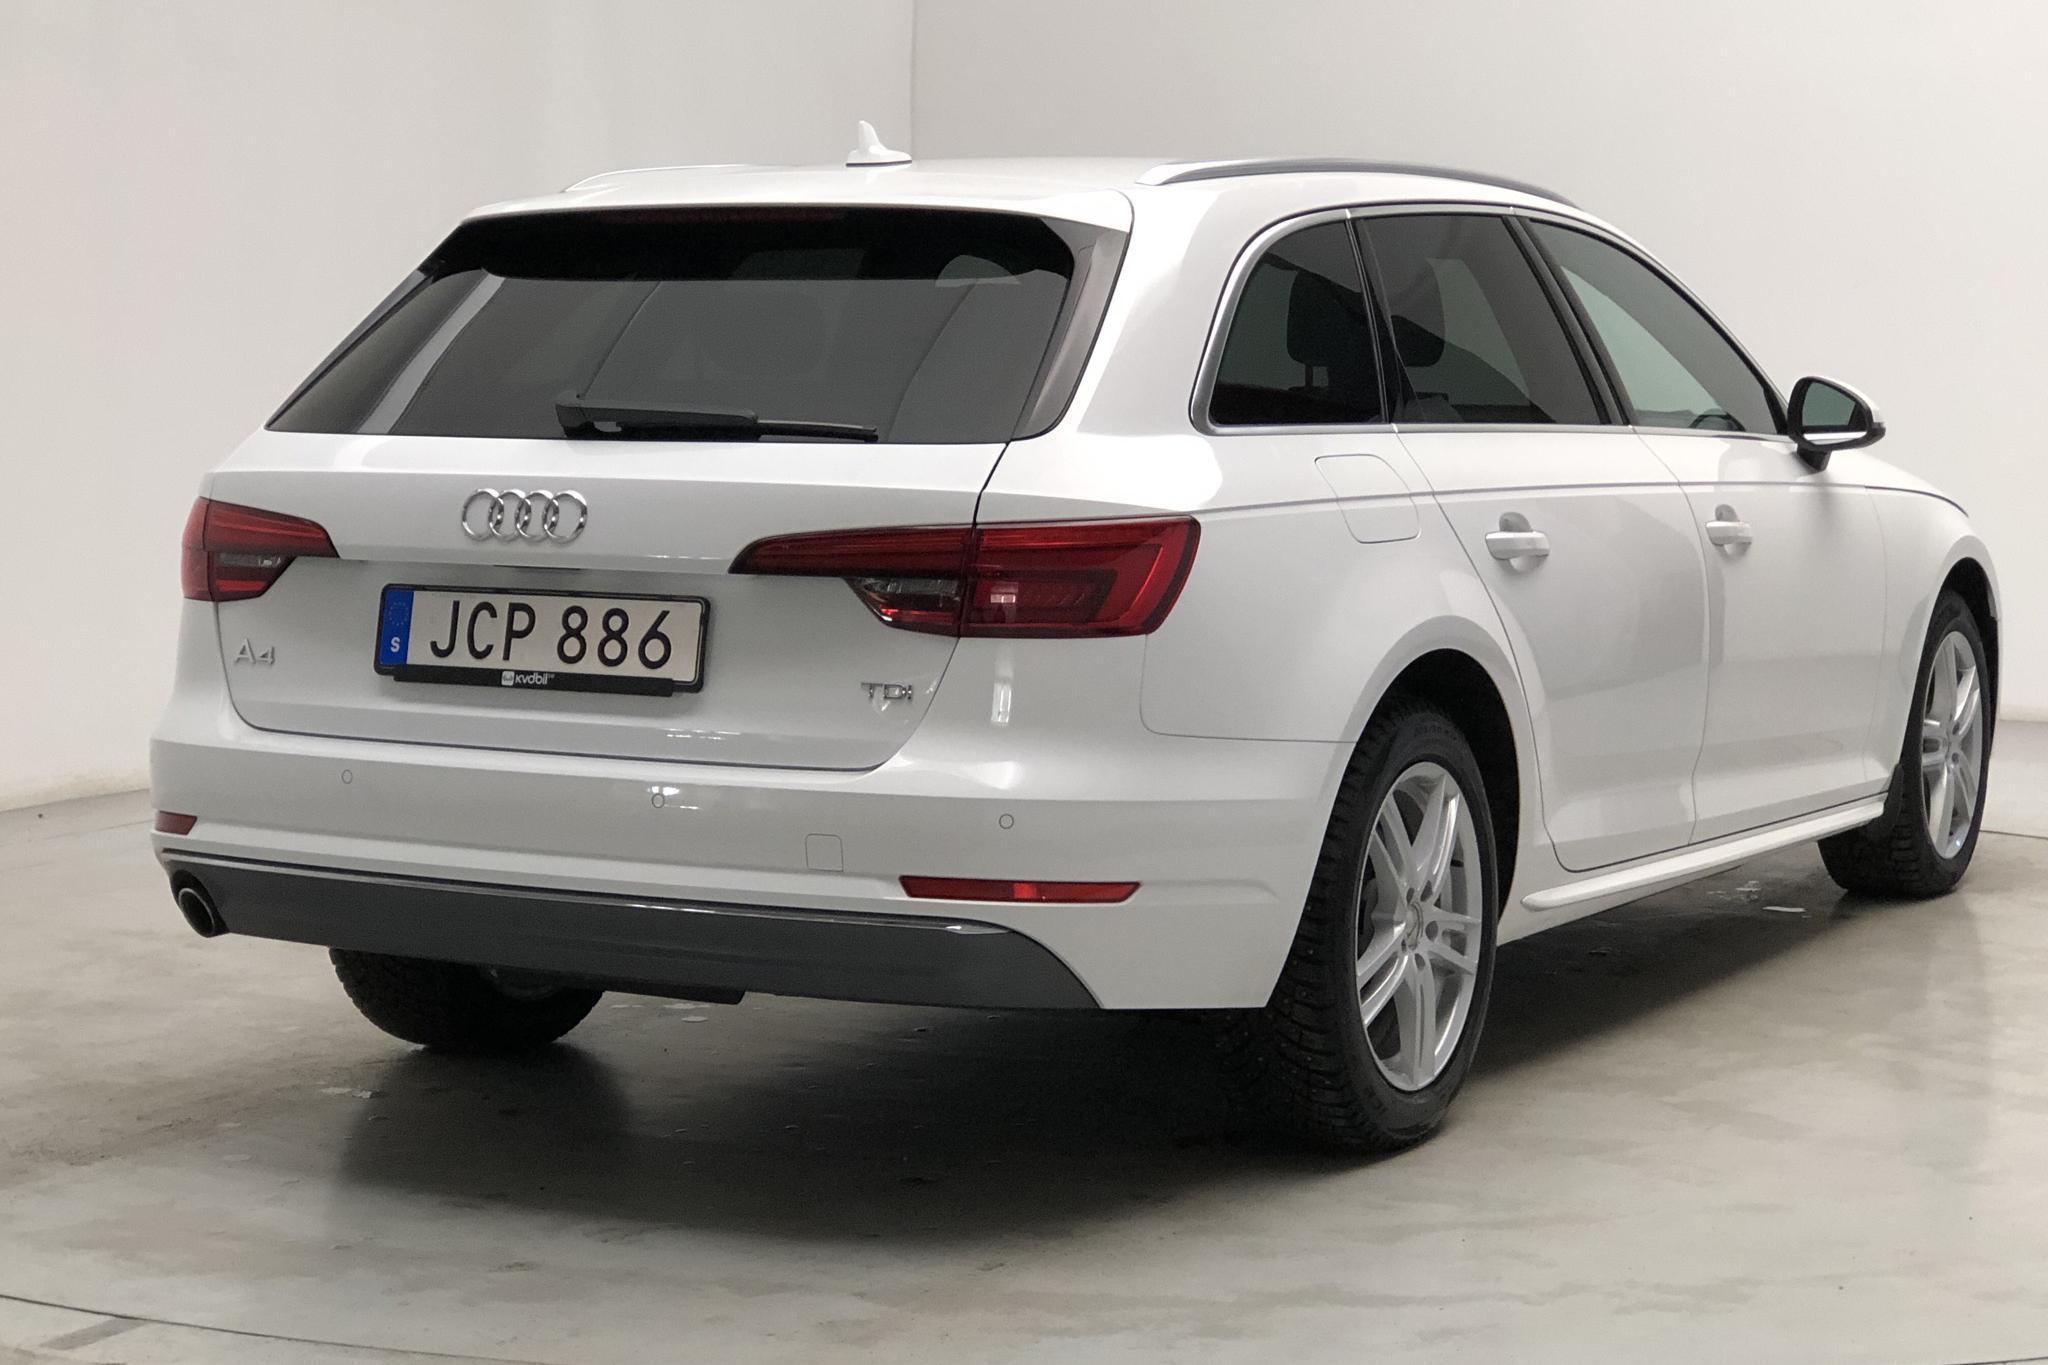 Audi A4 2.0 TDI Avant (150hk) - 135 770 km - Automatic - white - 2017